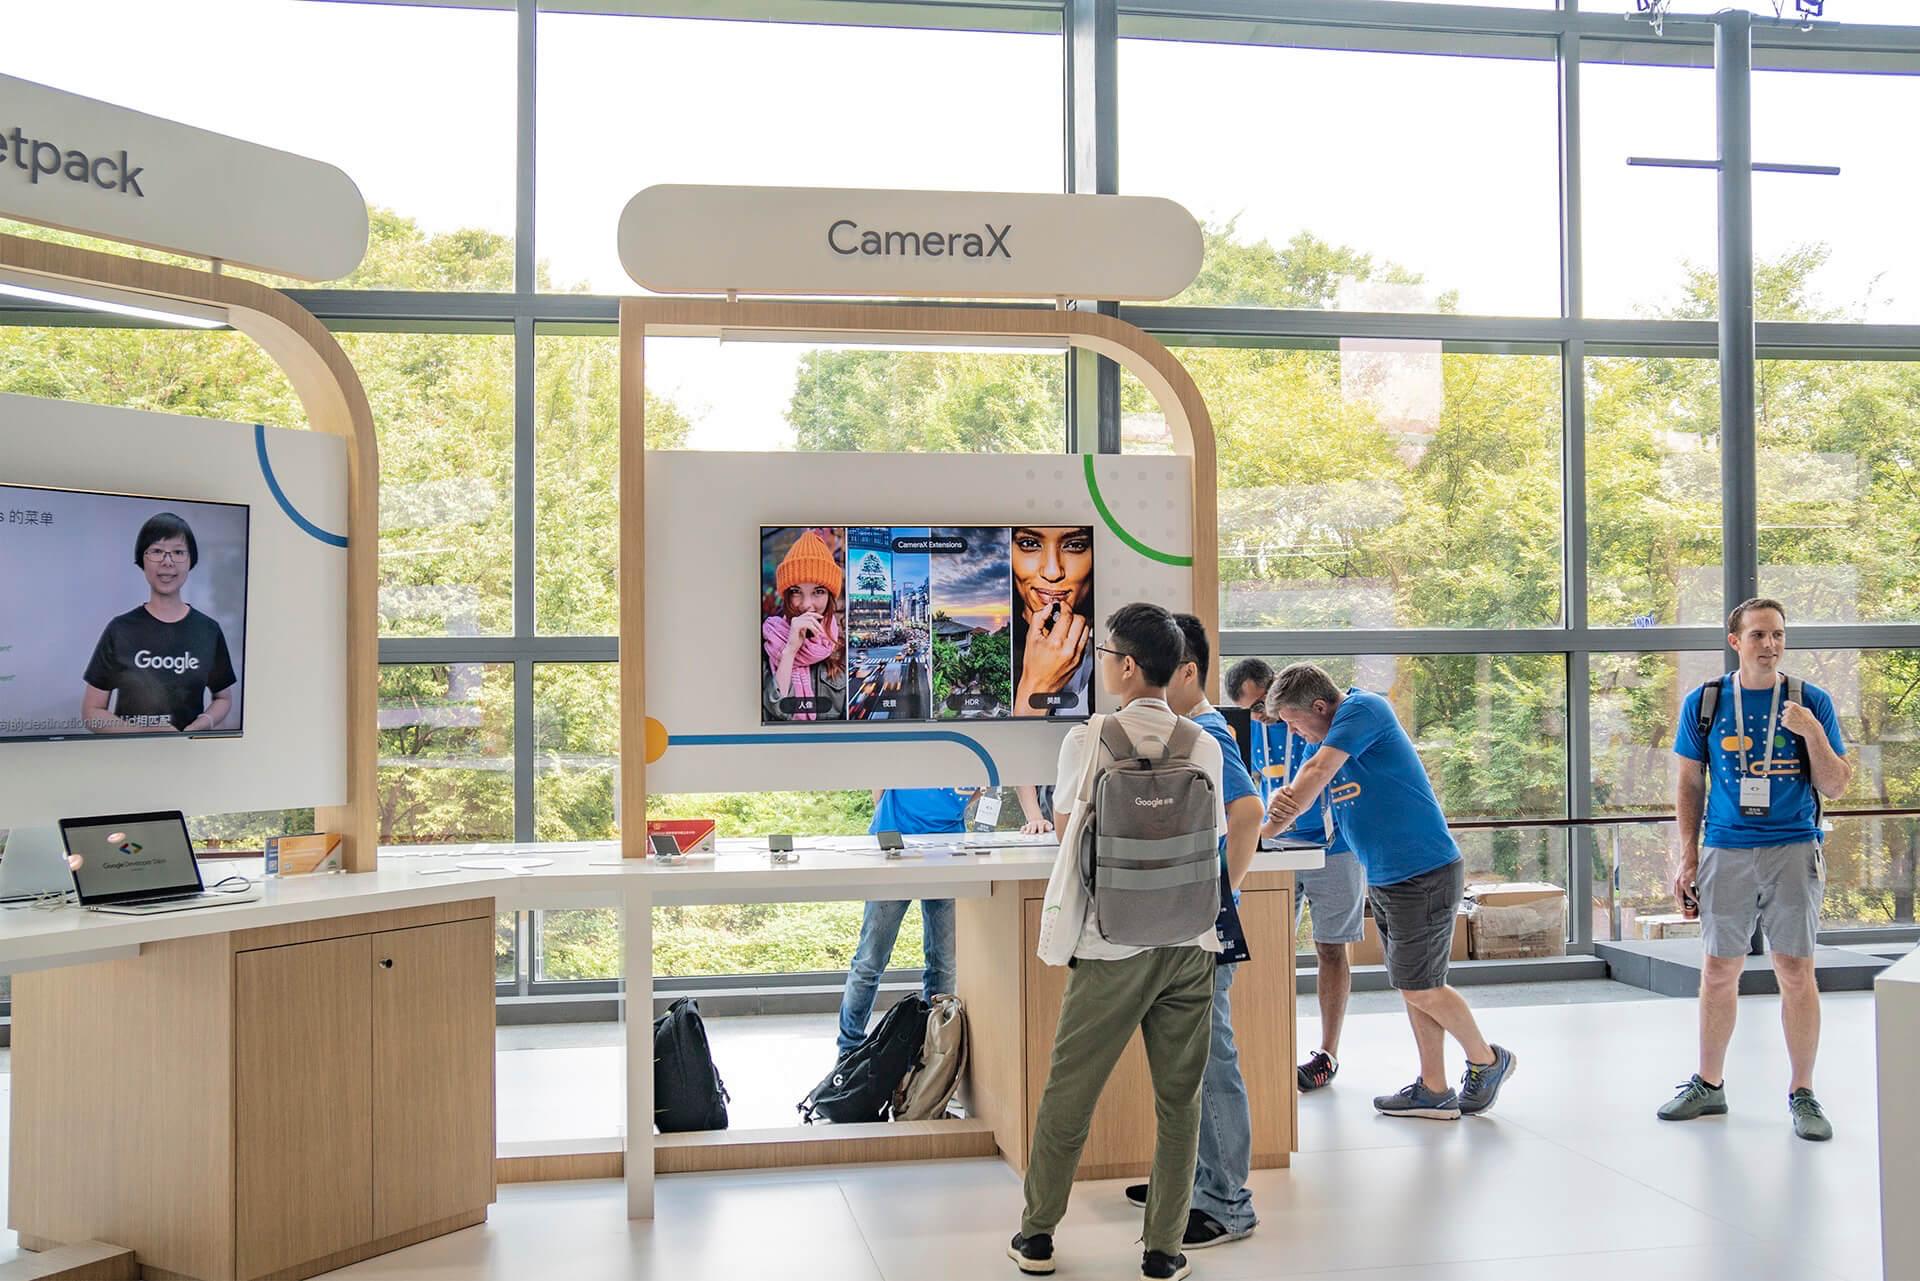 Google CameraX